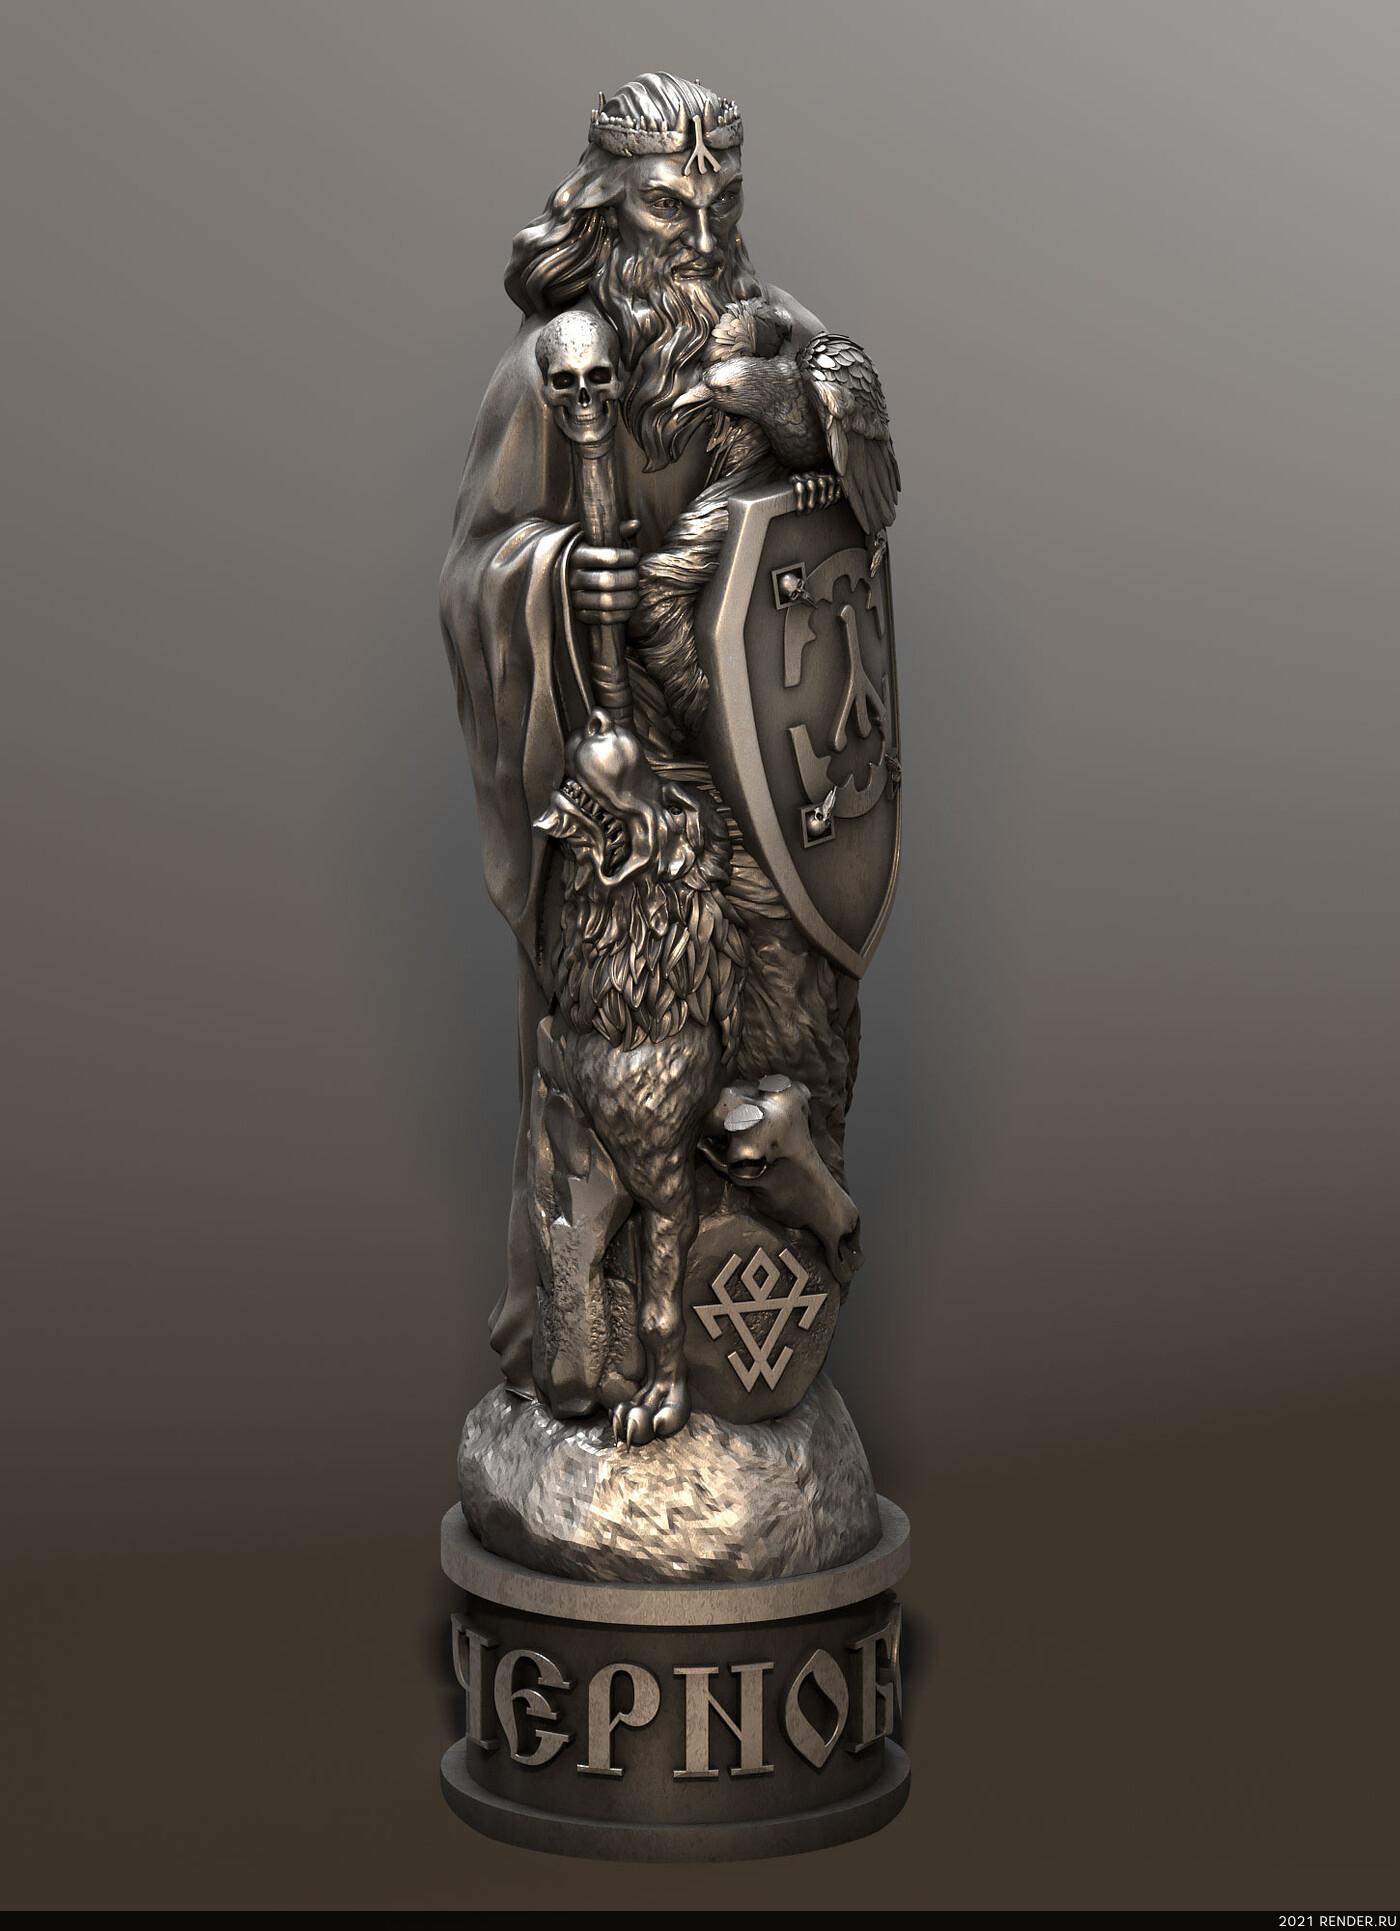 скульптура, модели для чпу, stl